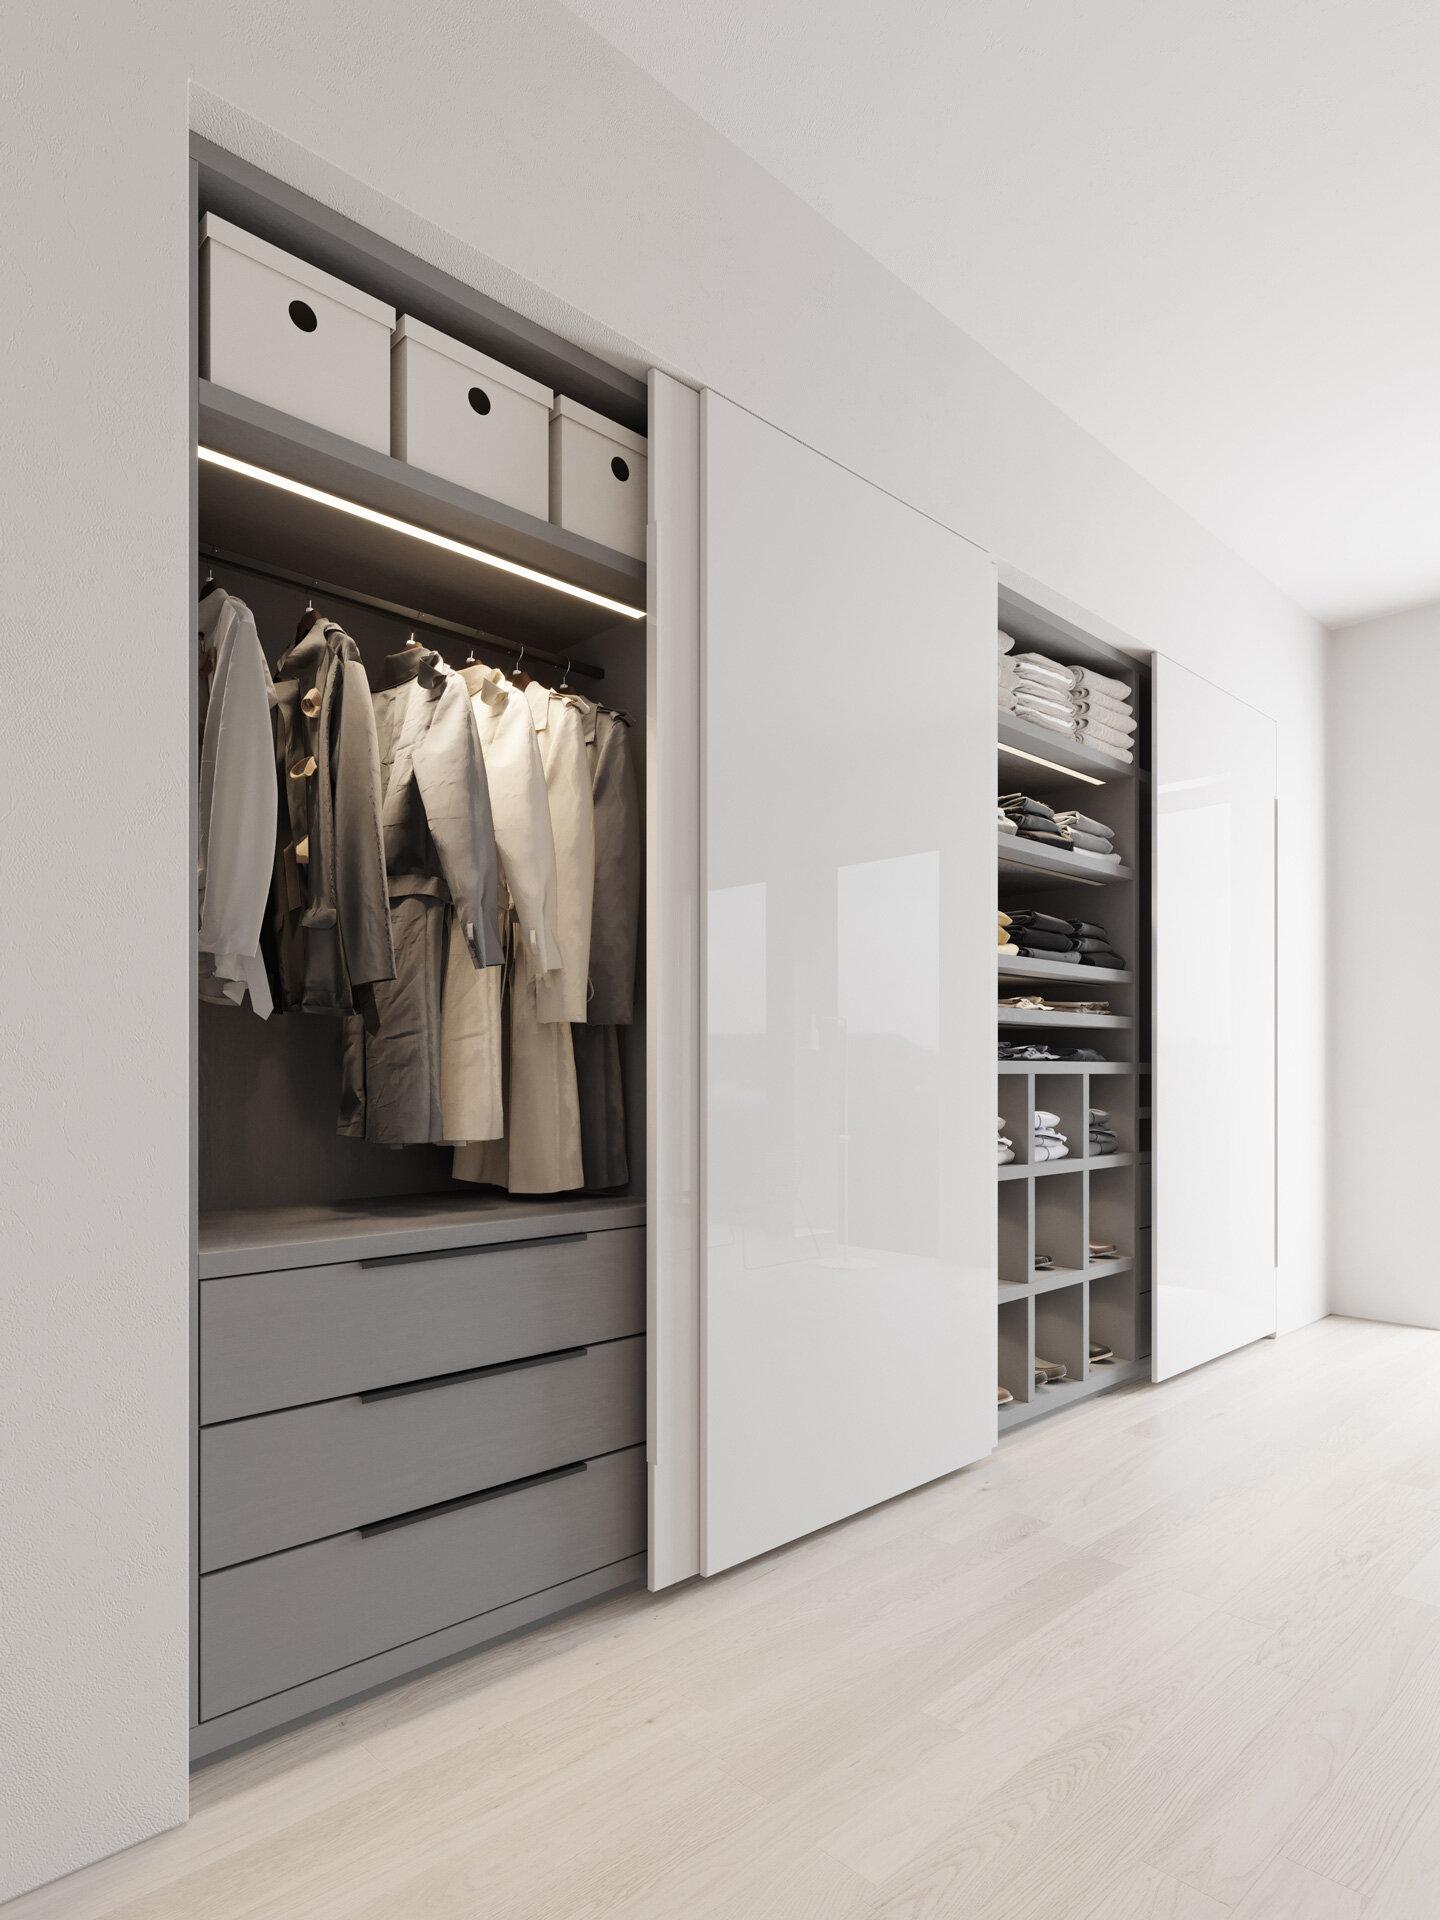 Wardrobe product 3D visualisation